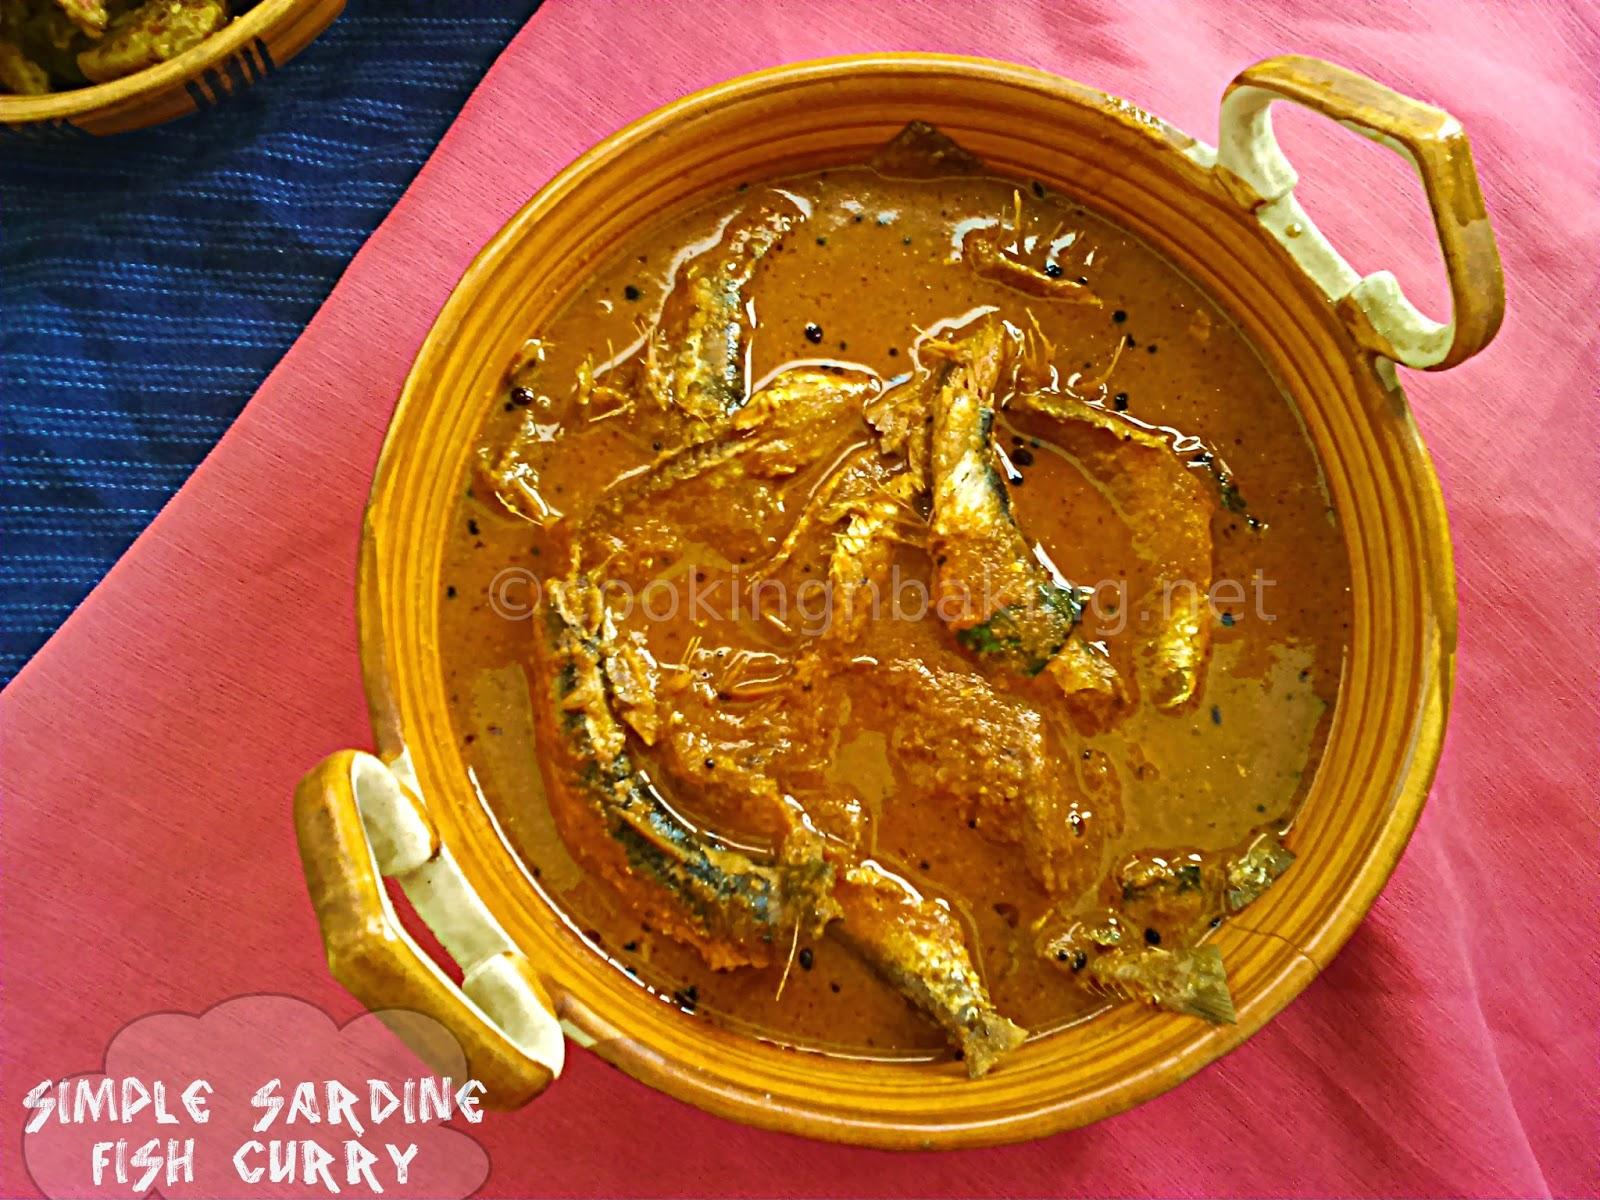 Simple Sardine Fish Curry